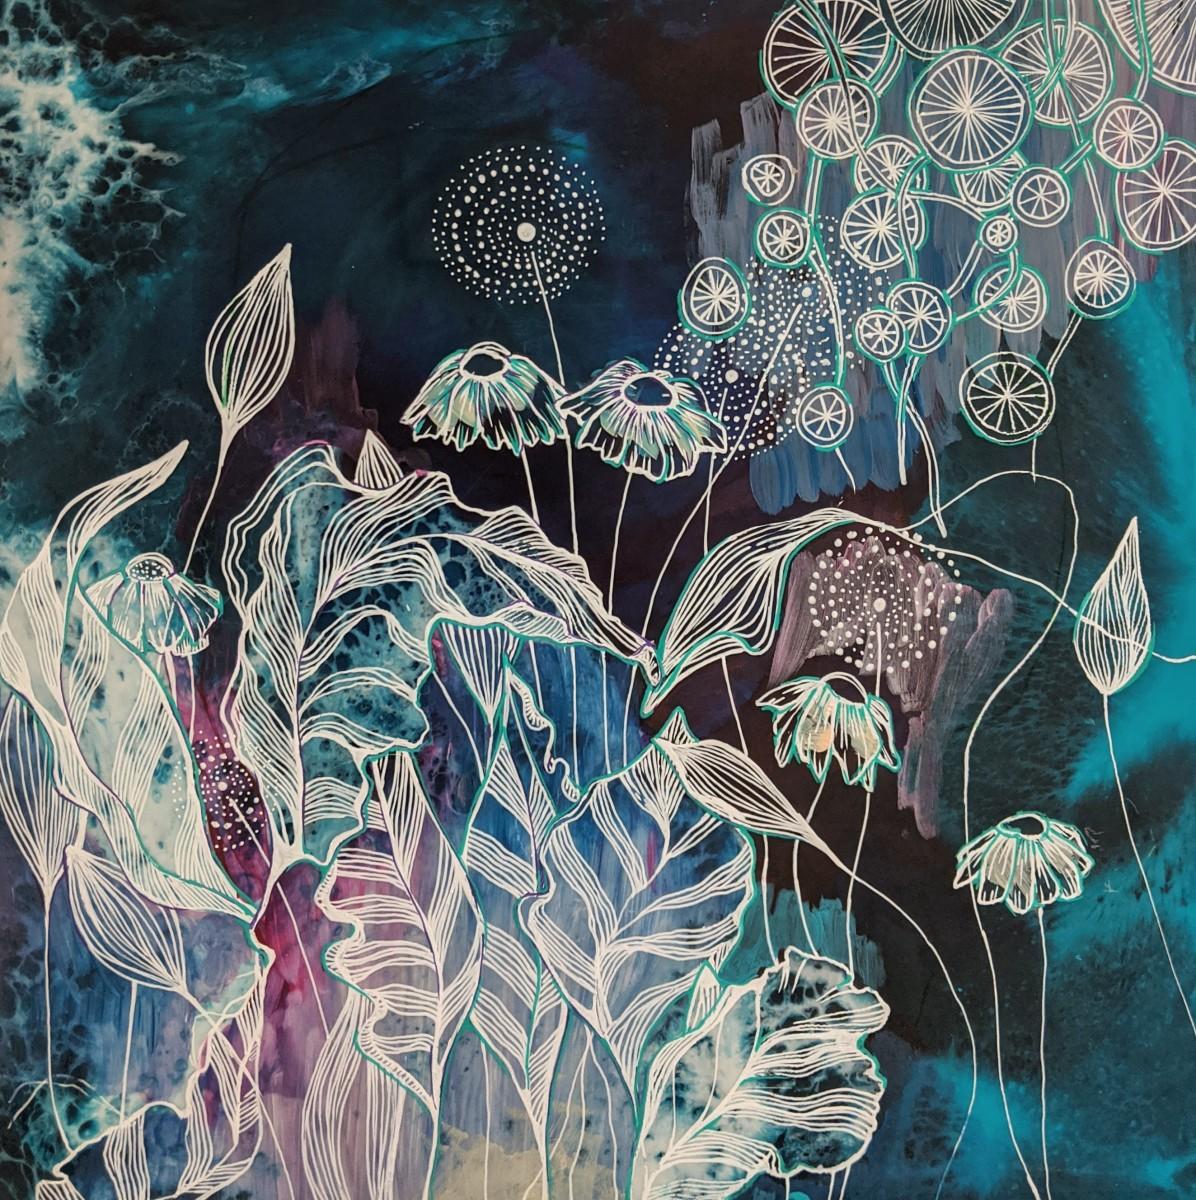 awaken by Kellie Kawahara-Niimi